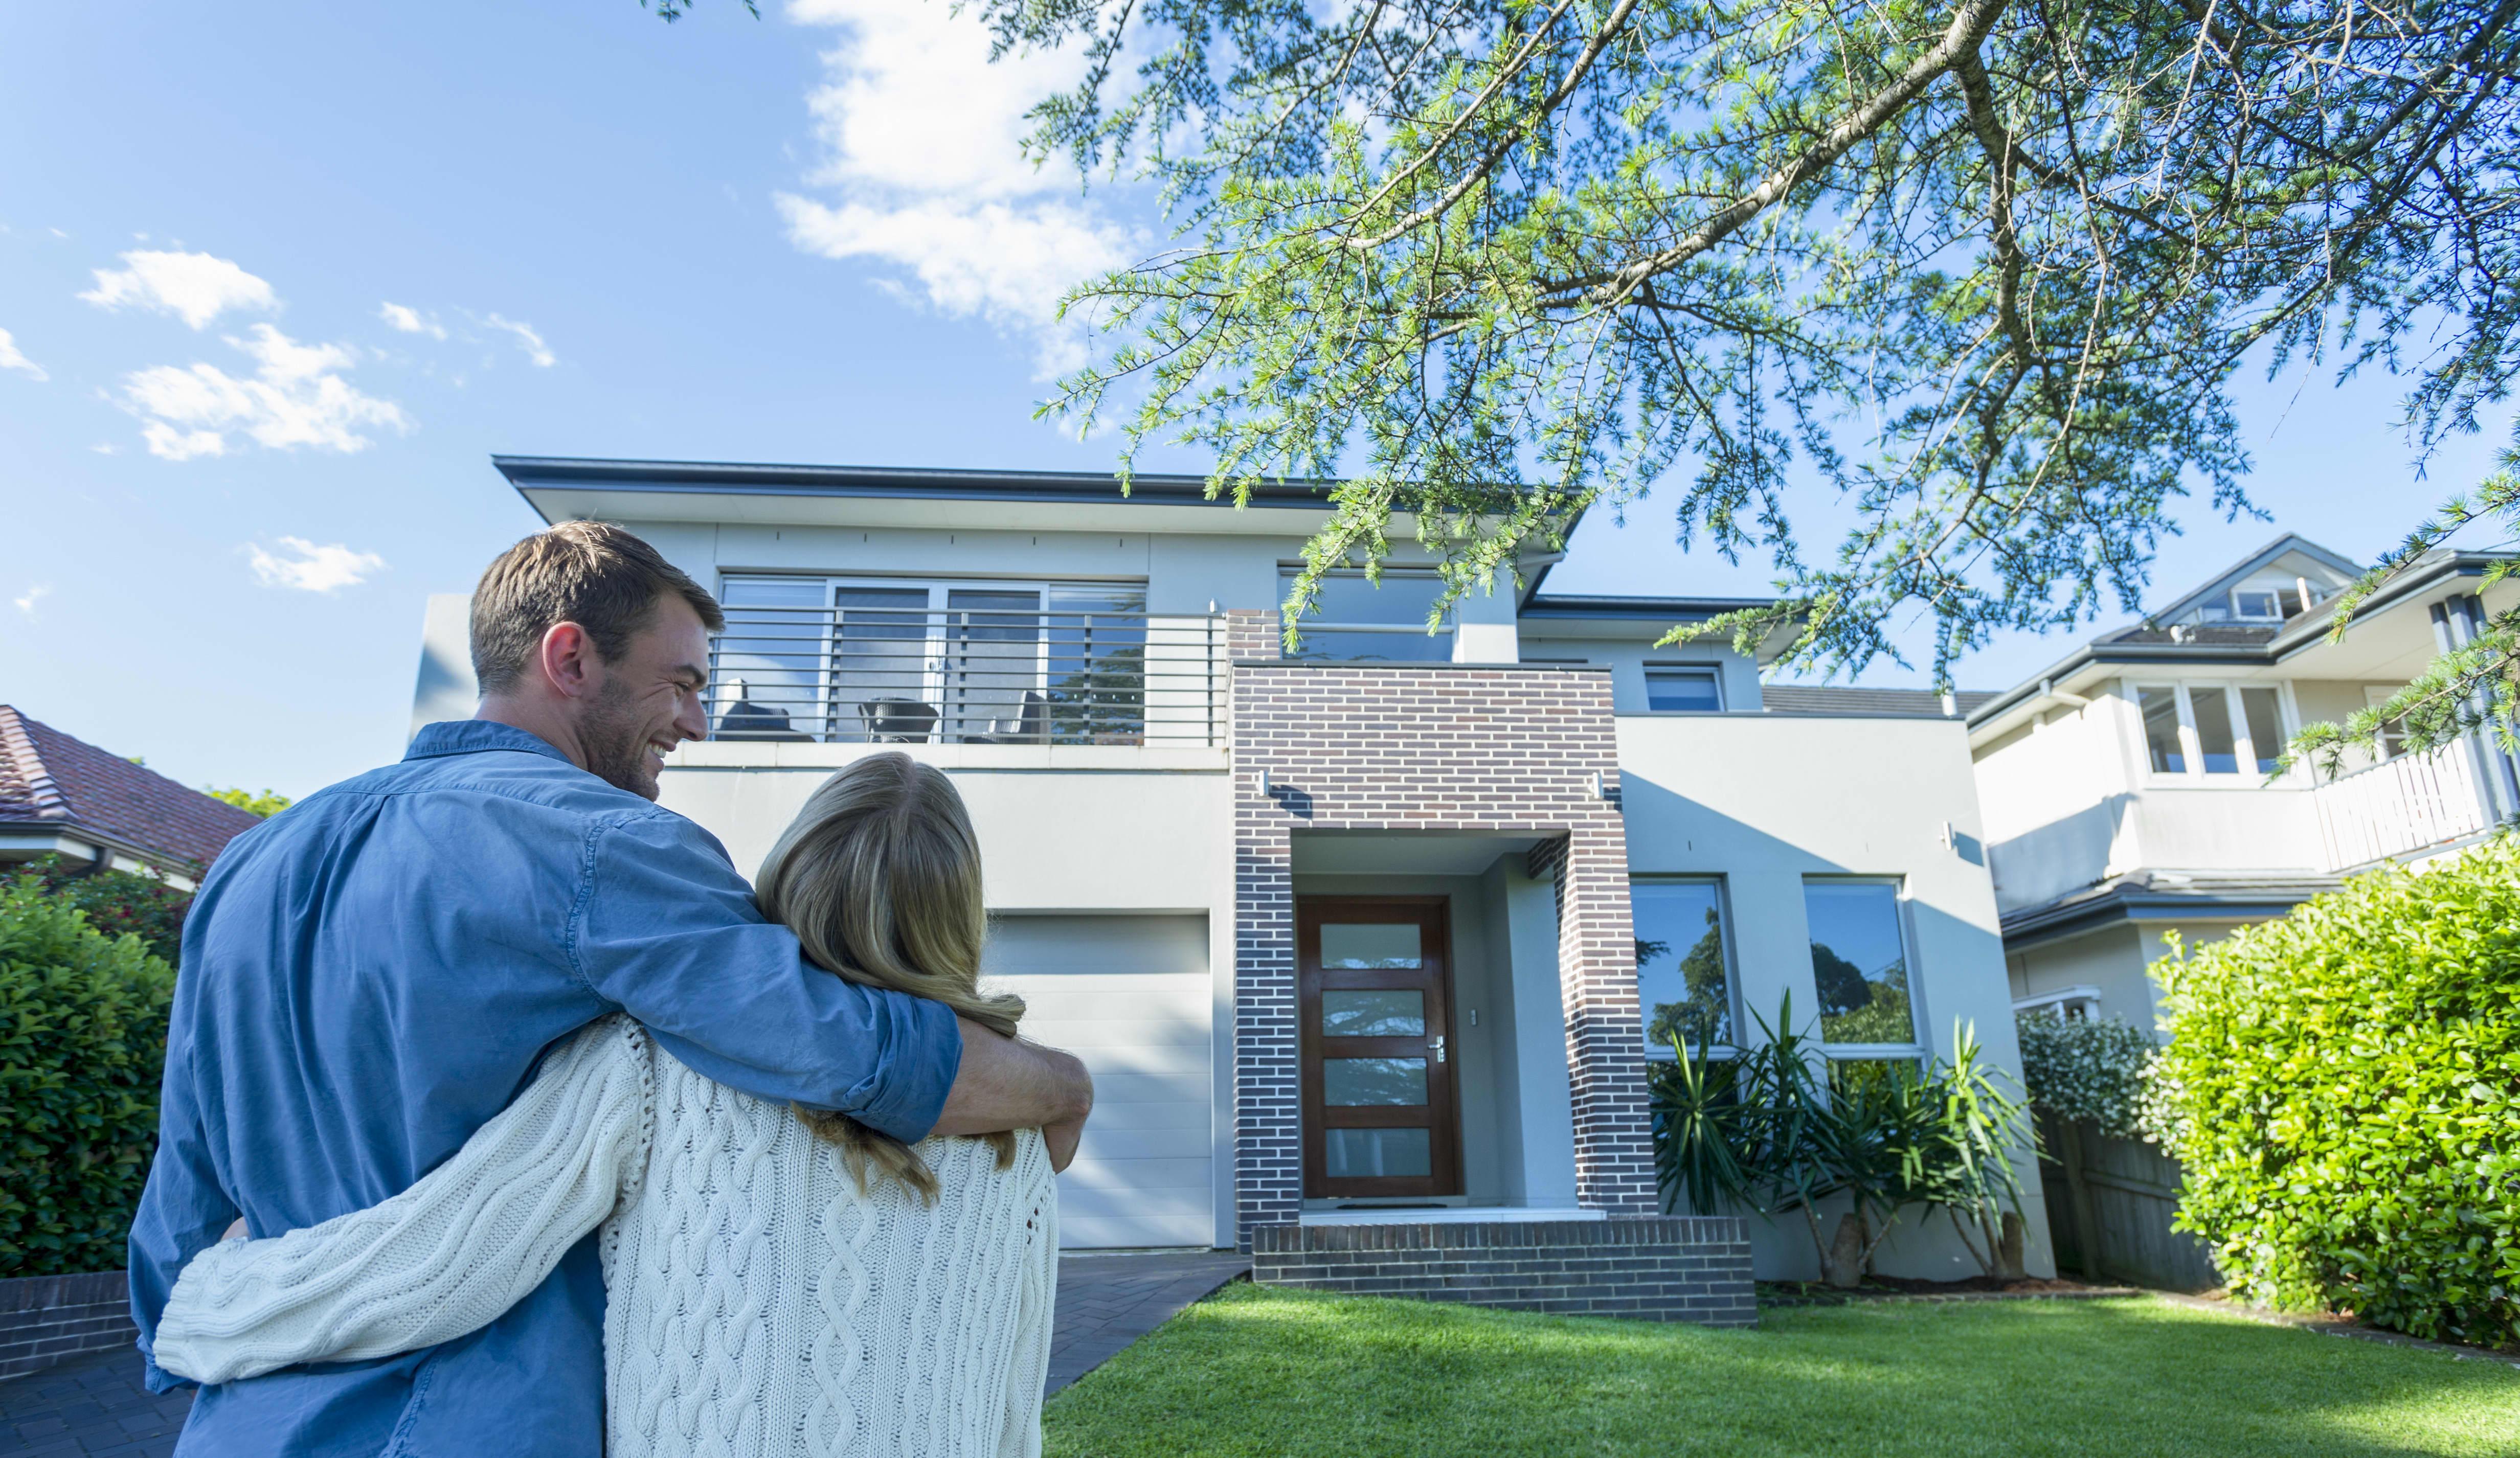 Картинки по запросу Why Are People Buying Newport Beach Real Estate?